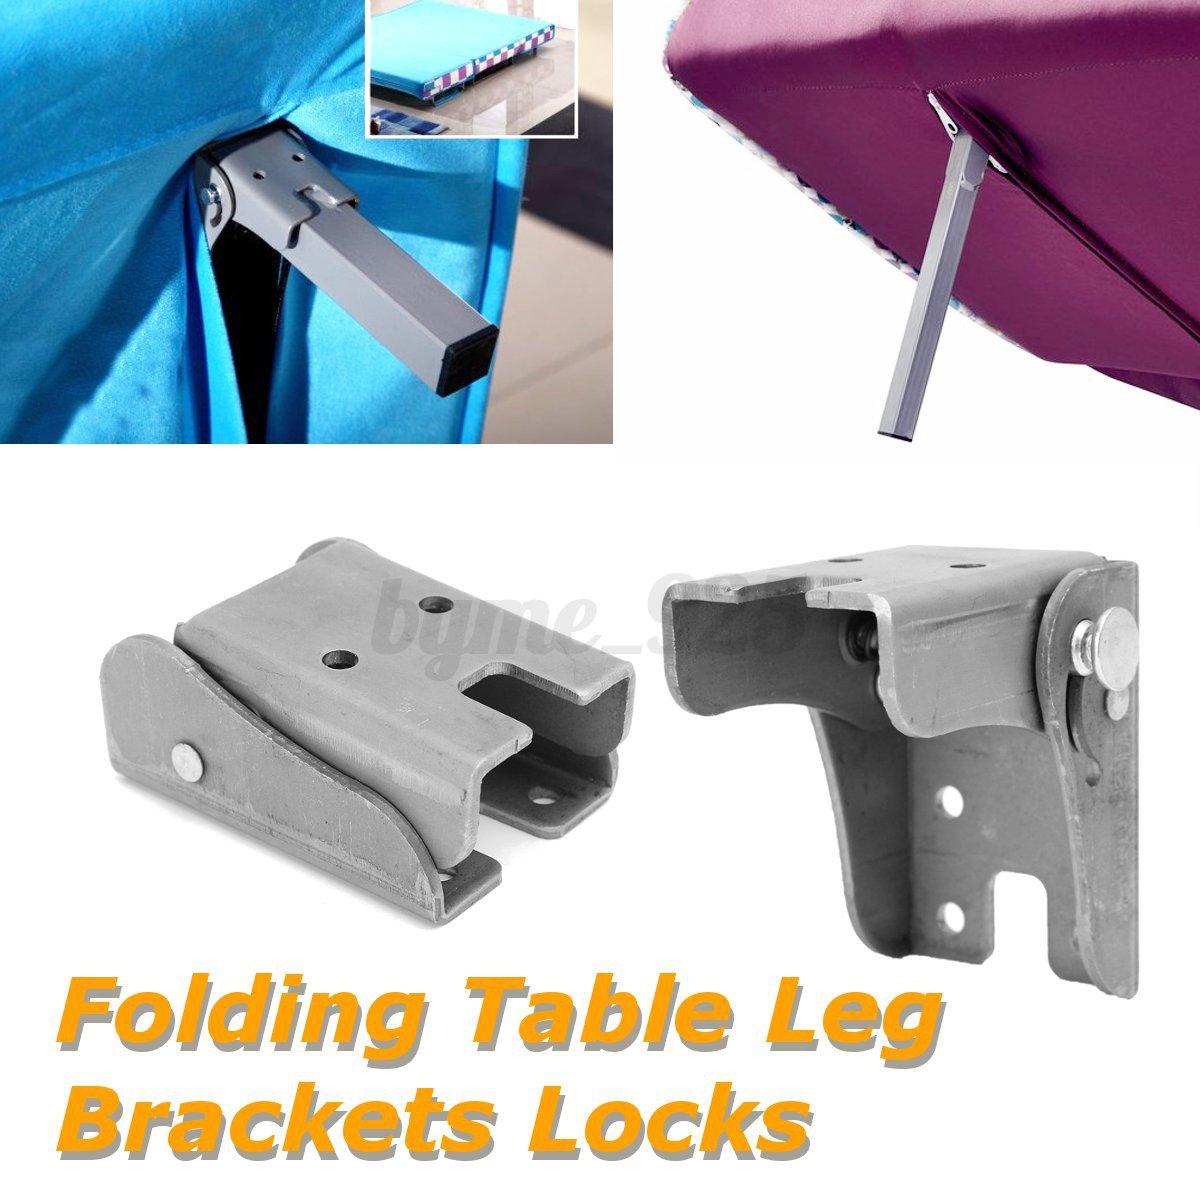 Details About 1 2 4pcs Folding Extension Table Leg Bracket Ing Self Lock Foldable Feet Diy